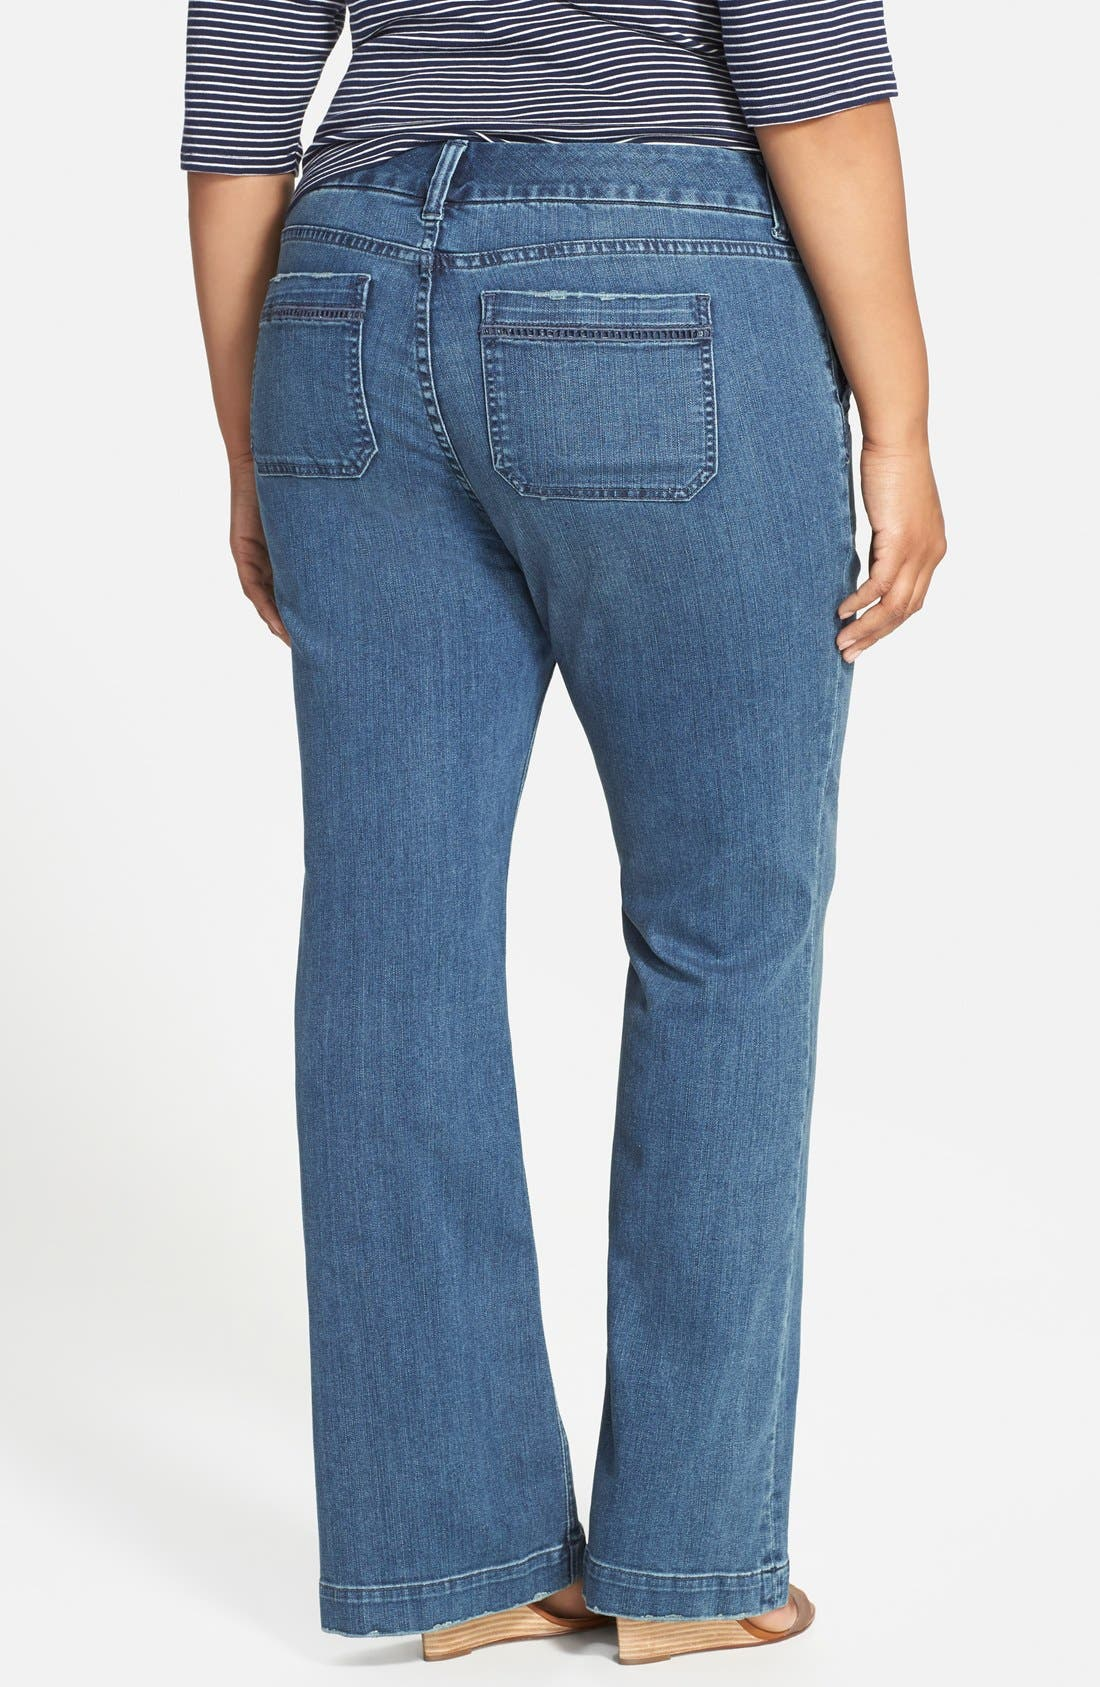 Alternate Image 2  - Melissa McCarthy Seven7 Stretch Flare Leg Jeans (Deluxe Blue) (Plus Size)